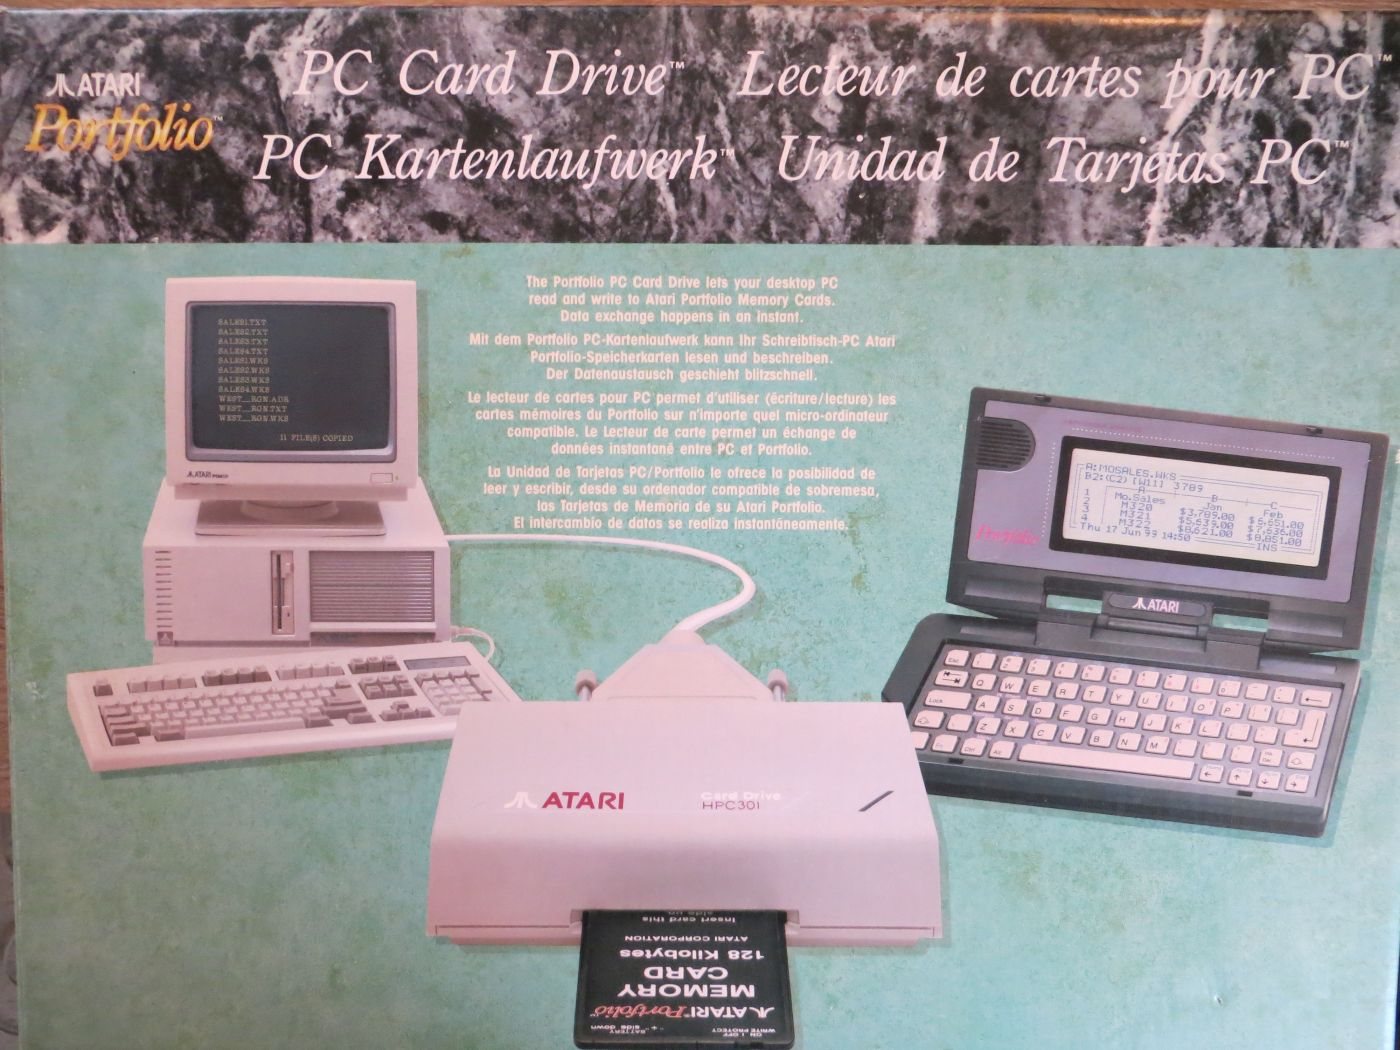 PC Card Drive